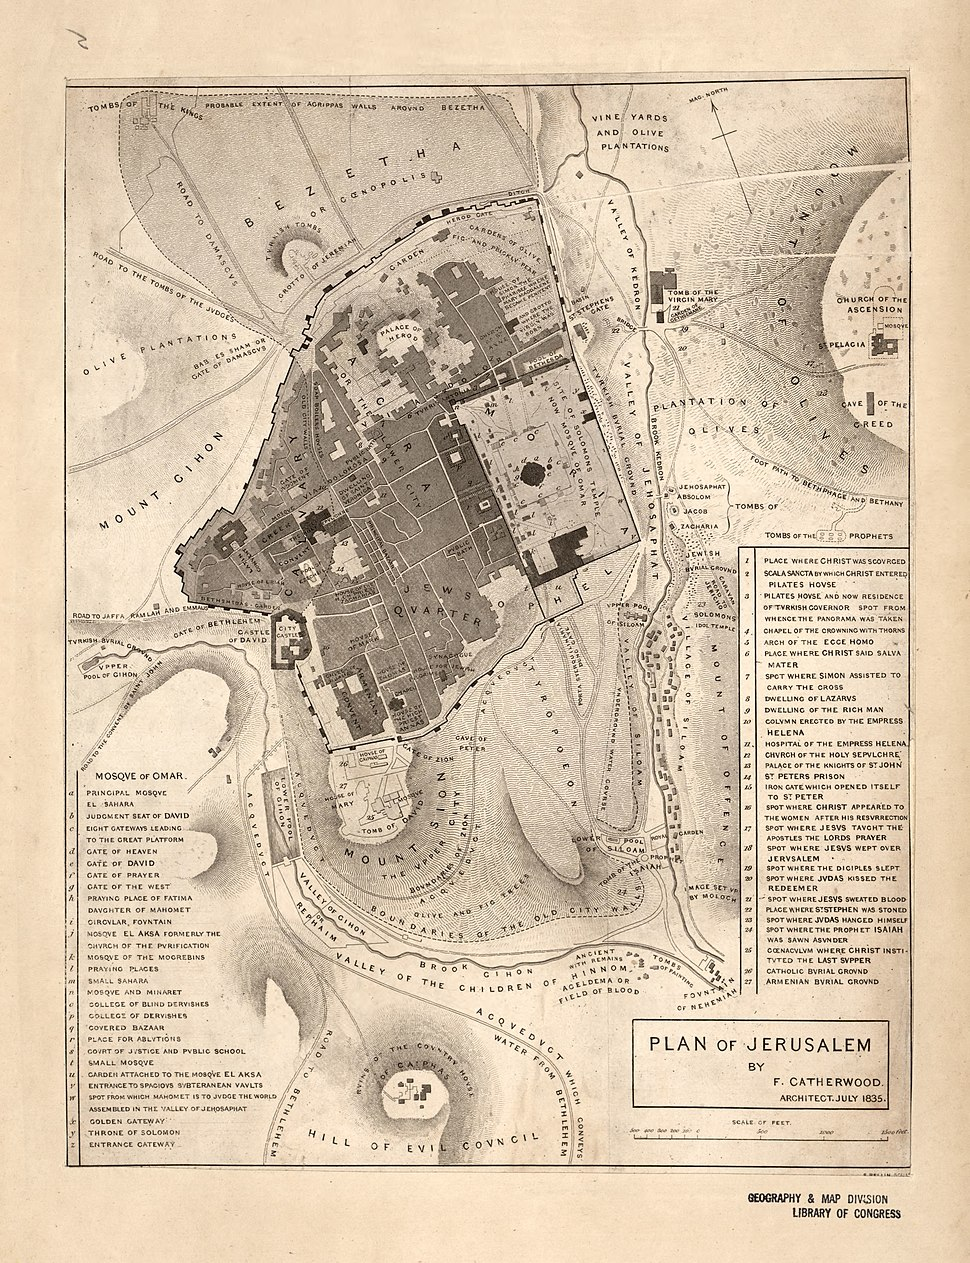 Plan of Jerusalem LOC 2009579461